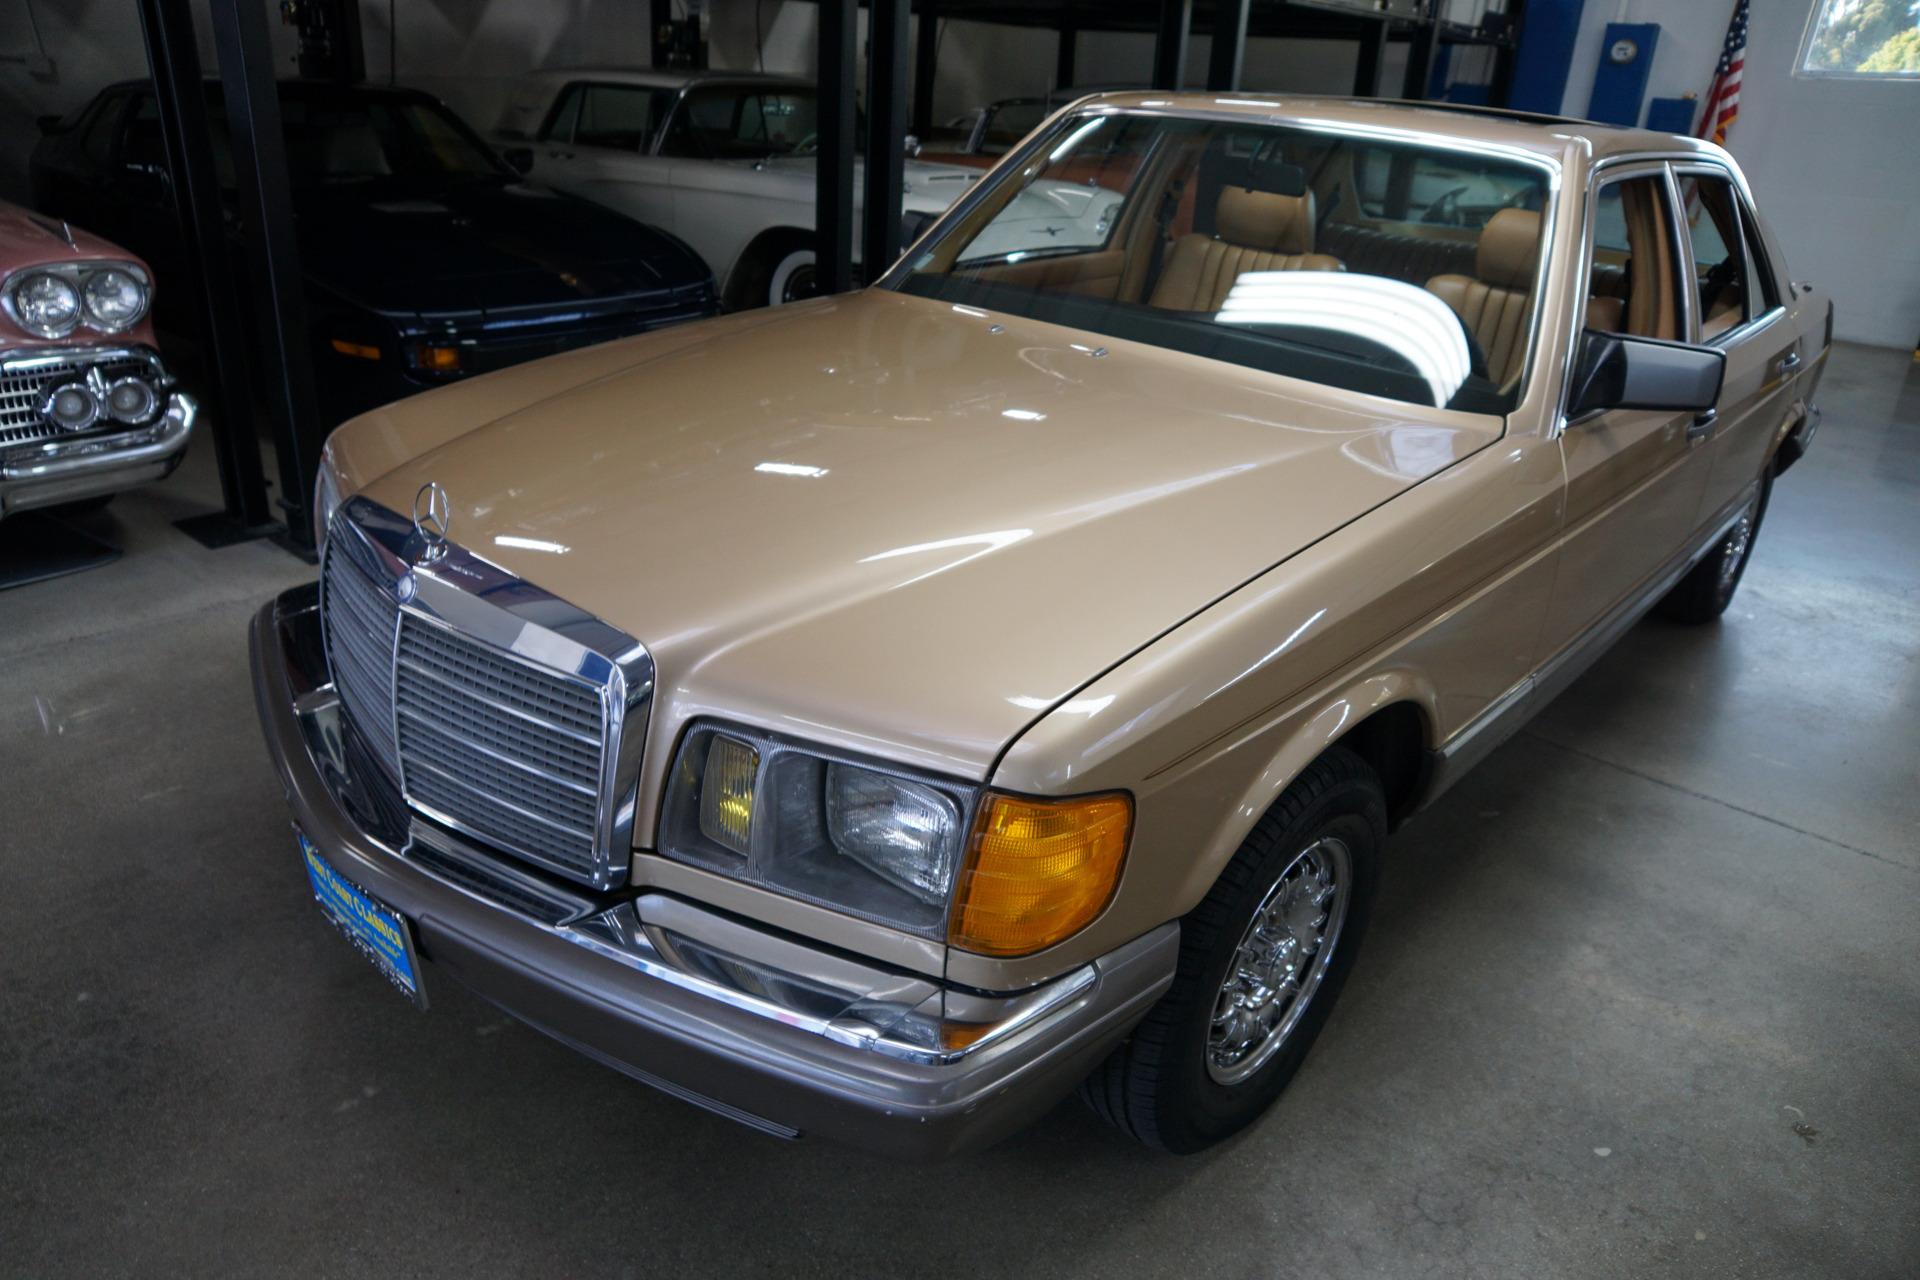 Photo 1982 Mercedes-Benz 300SD TURBO DIESEL SEDAN WITH 82K ORIG MILES 300 SD